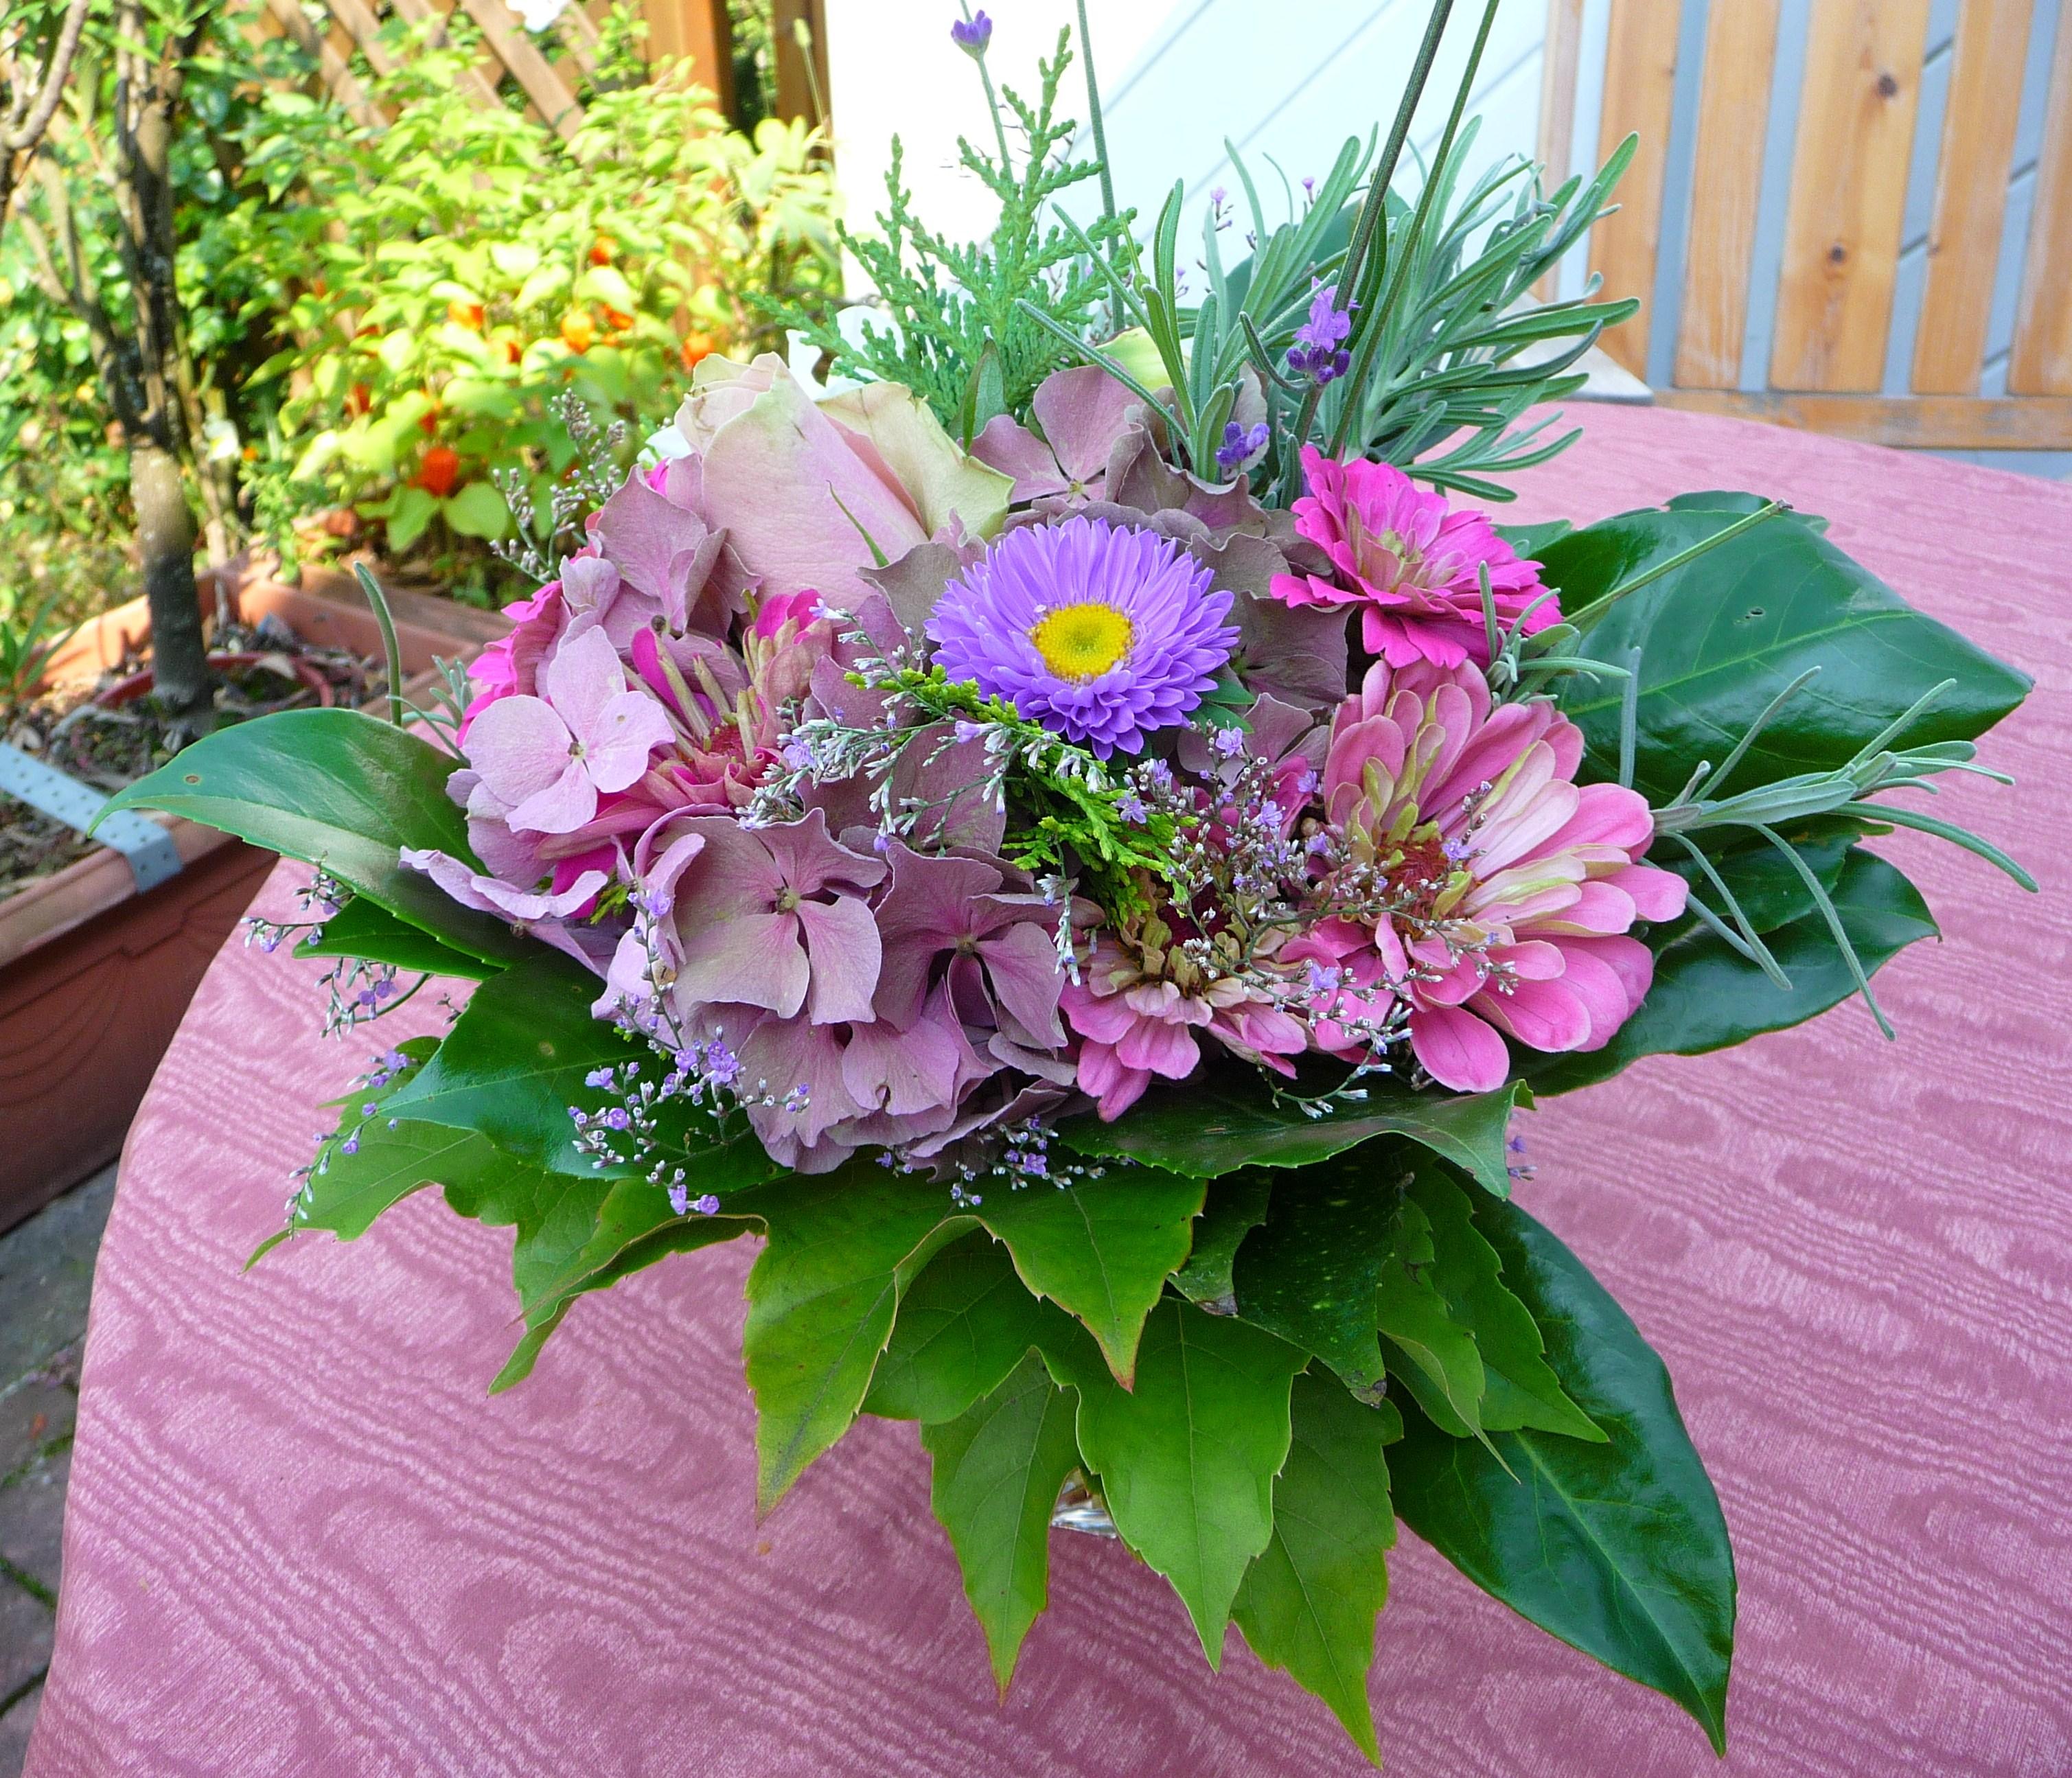 FileSptsommerlicher BlumenstrauJPG  Wikimedia Commons